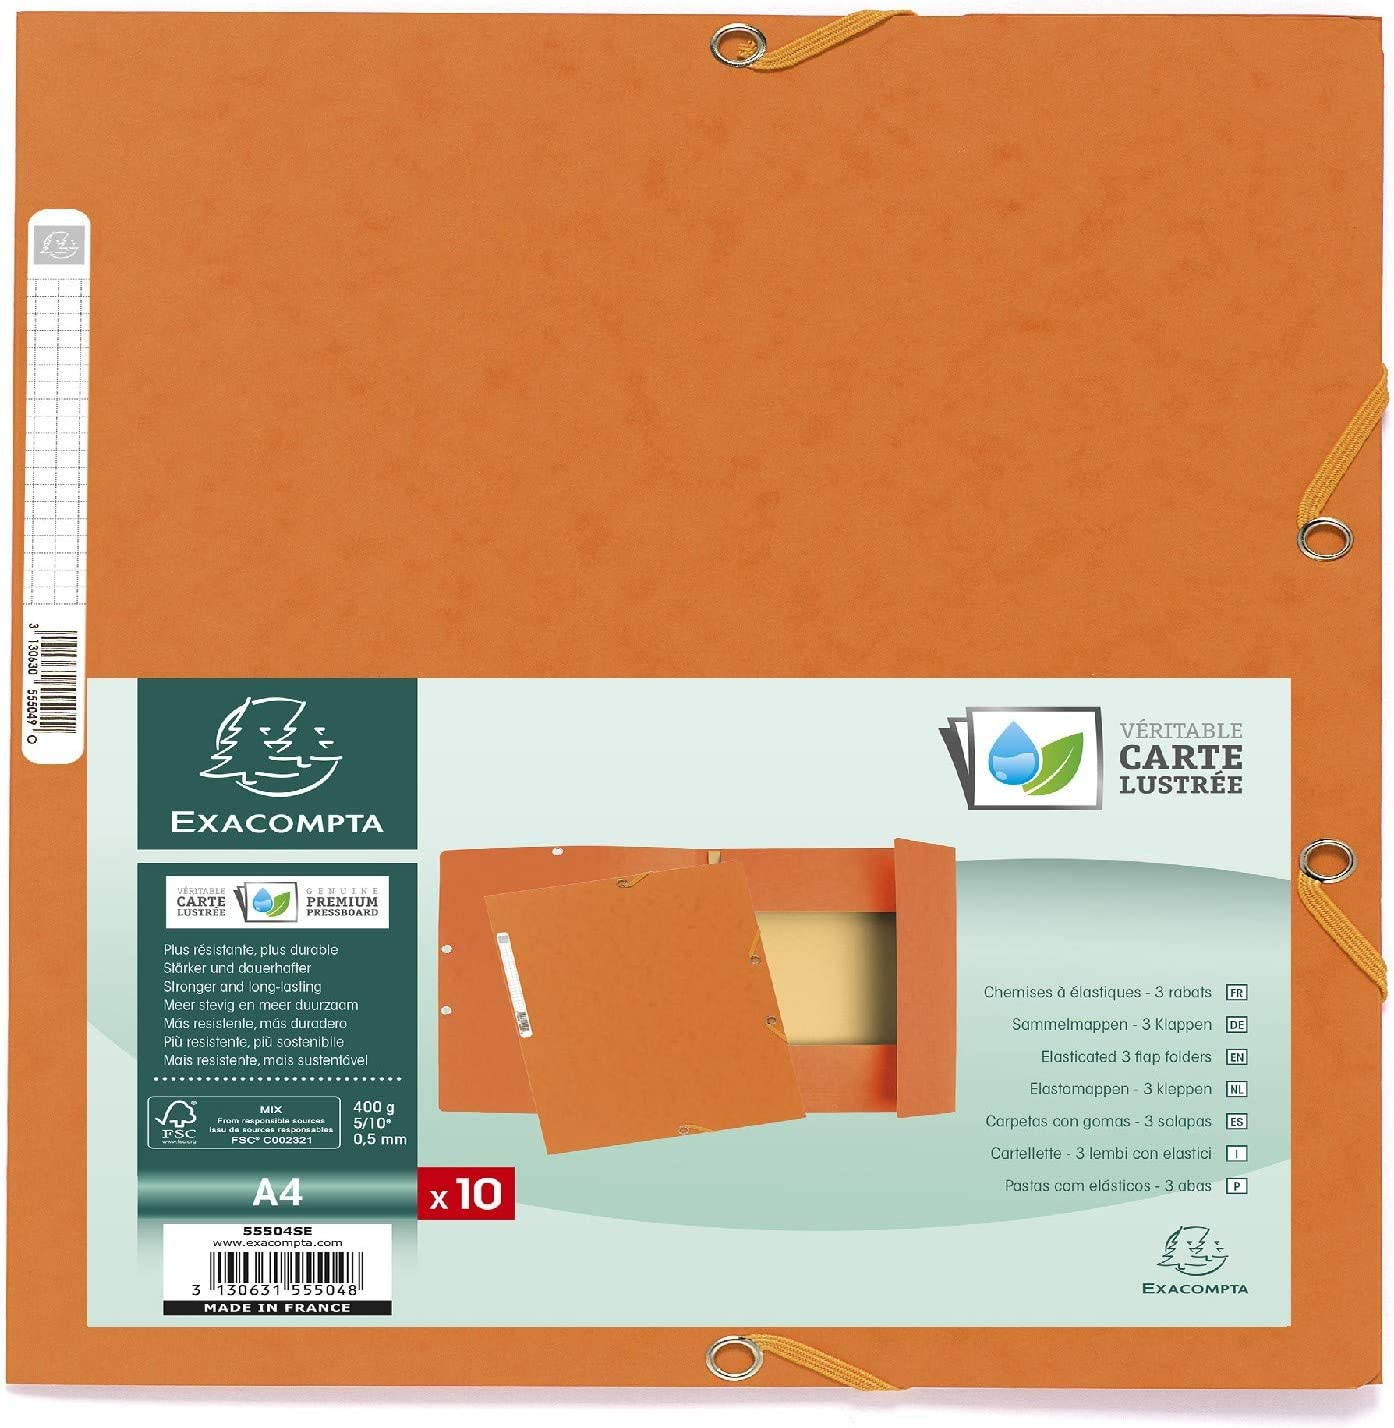 Exacompta 55504SE - Pack de 10 carpetas con goma, A4, color ...